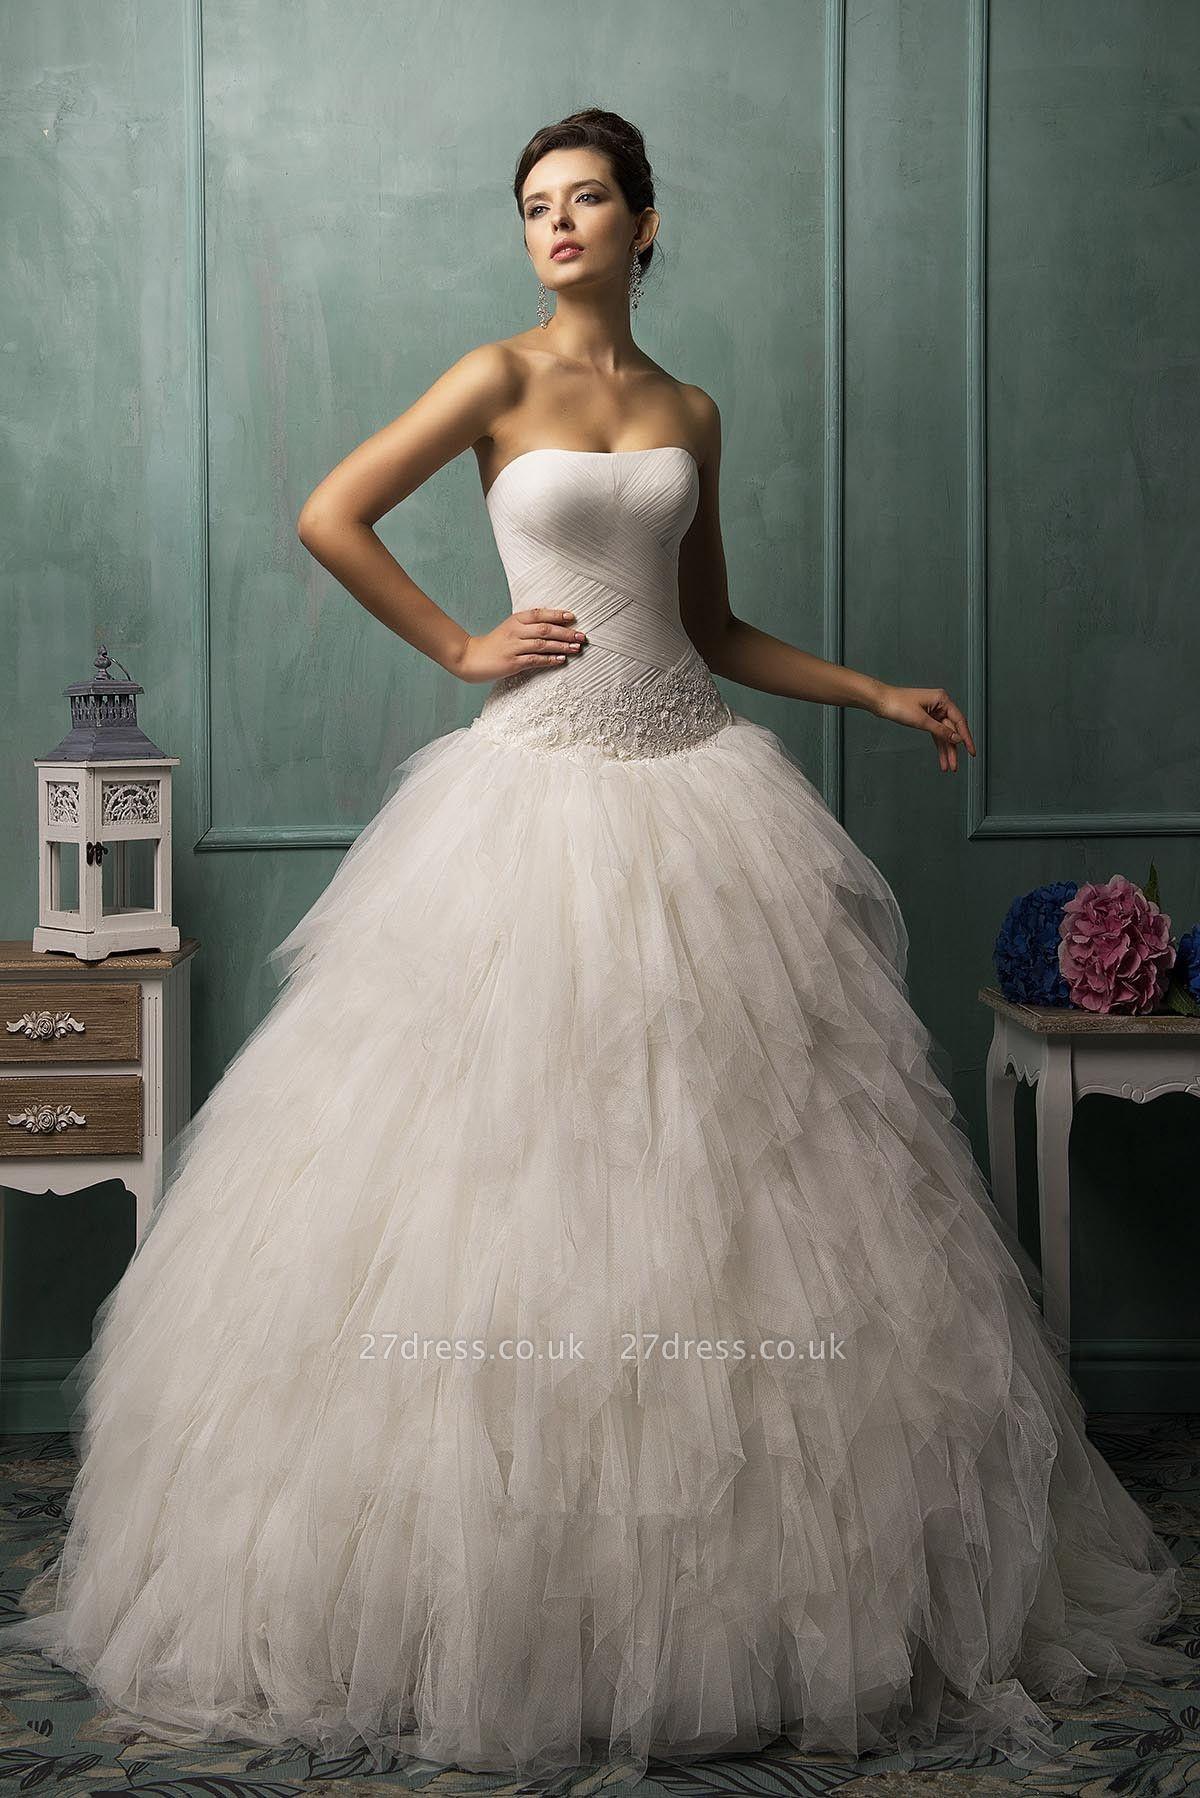 Modern Strapless Sleeveless Tulle Wedding Dress With Ruffles